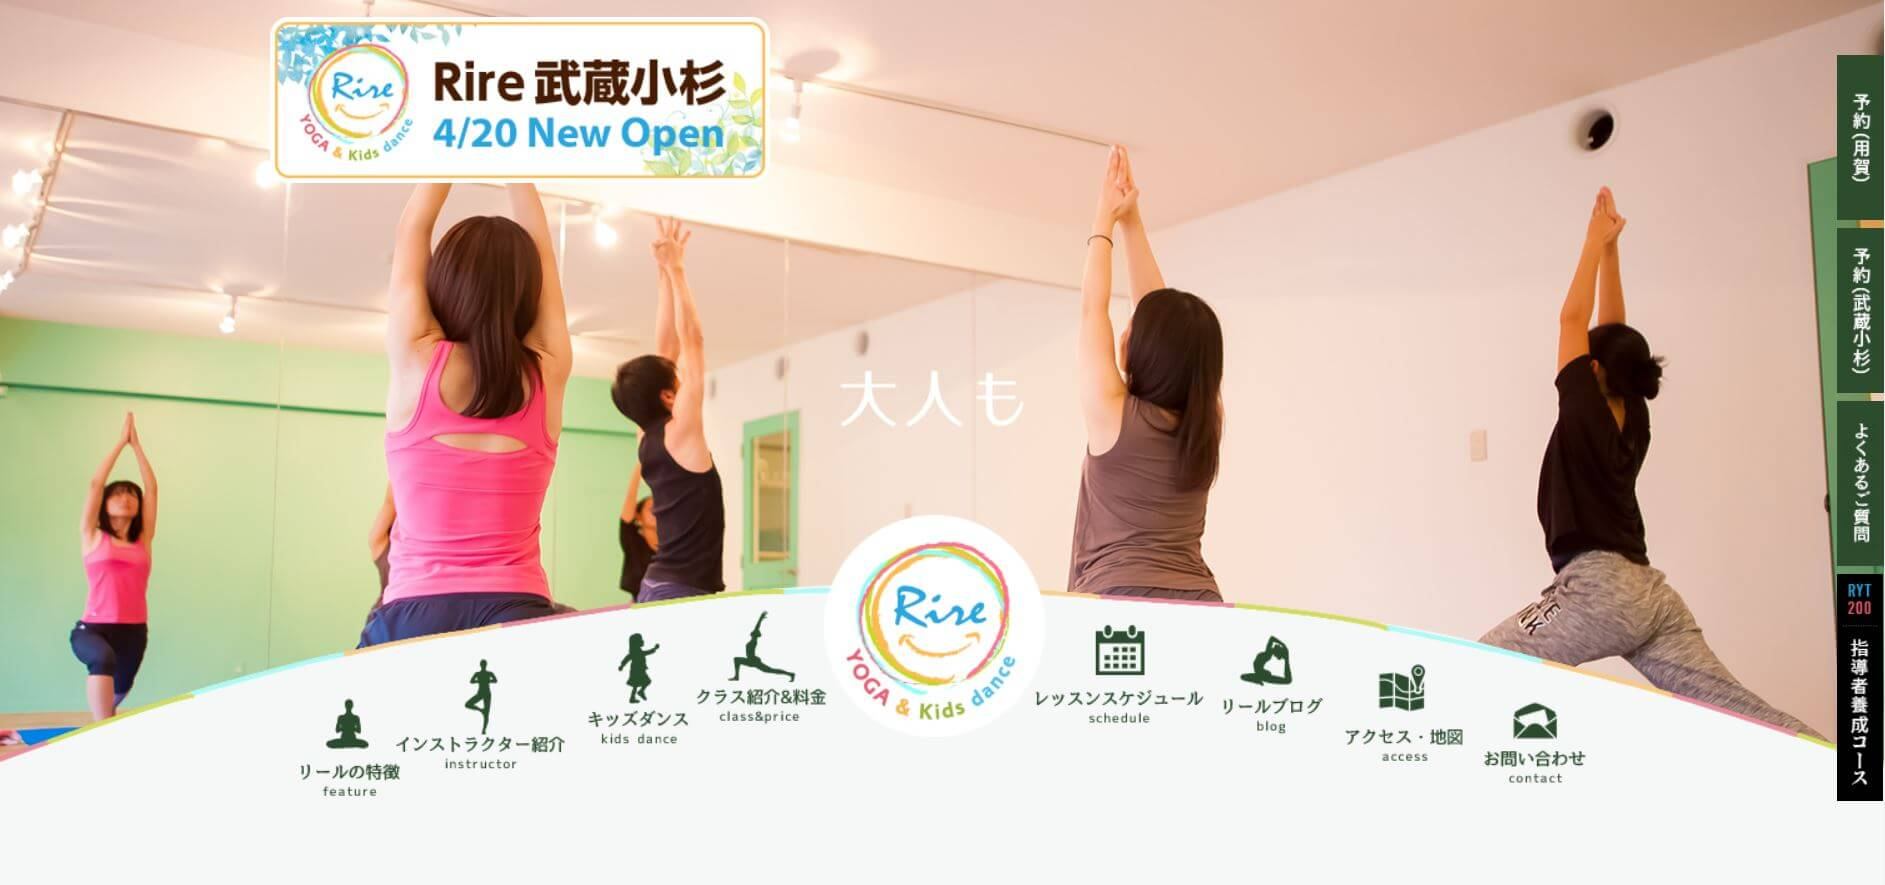 Rire yoga&kids dance(リール)